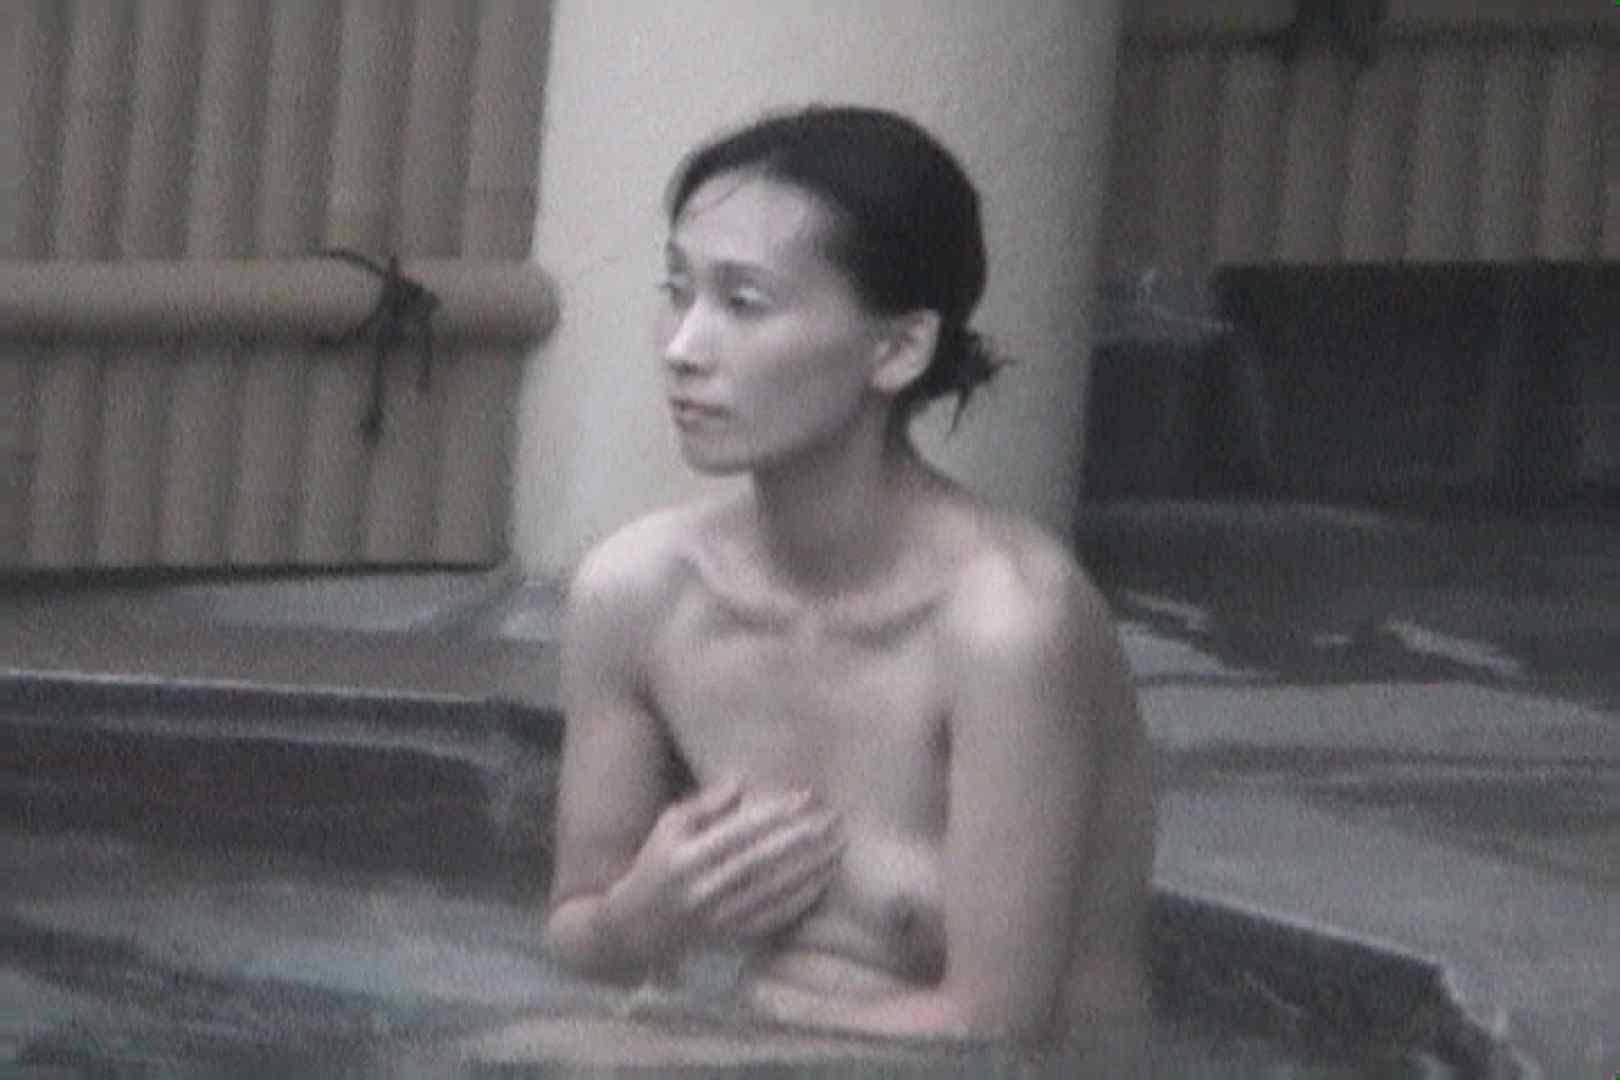 Aquaな露天風呂Vol.557 女体盗撮 盗撮ワレメ無修正動画無料 40連発 5